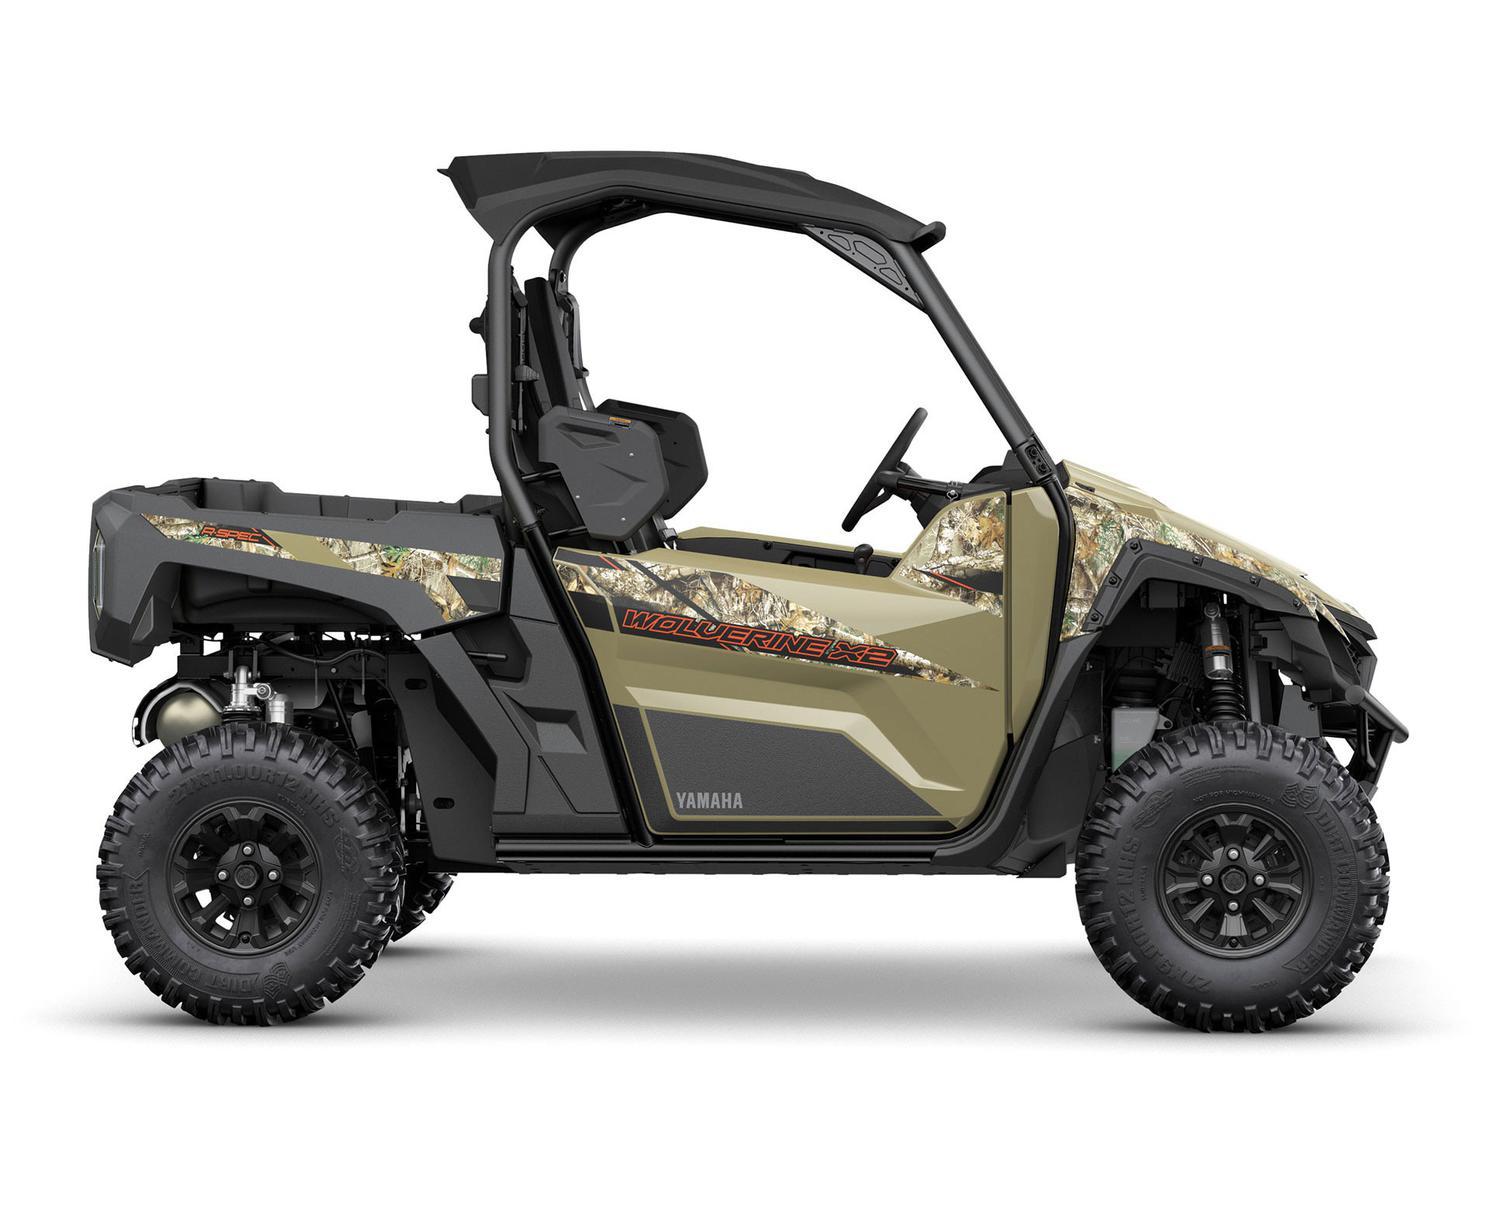 Yamaha Wolverine X2 850 R-SPEC Camouflage Realtree Edge 2022